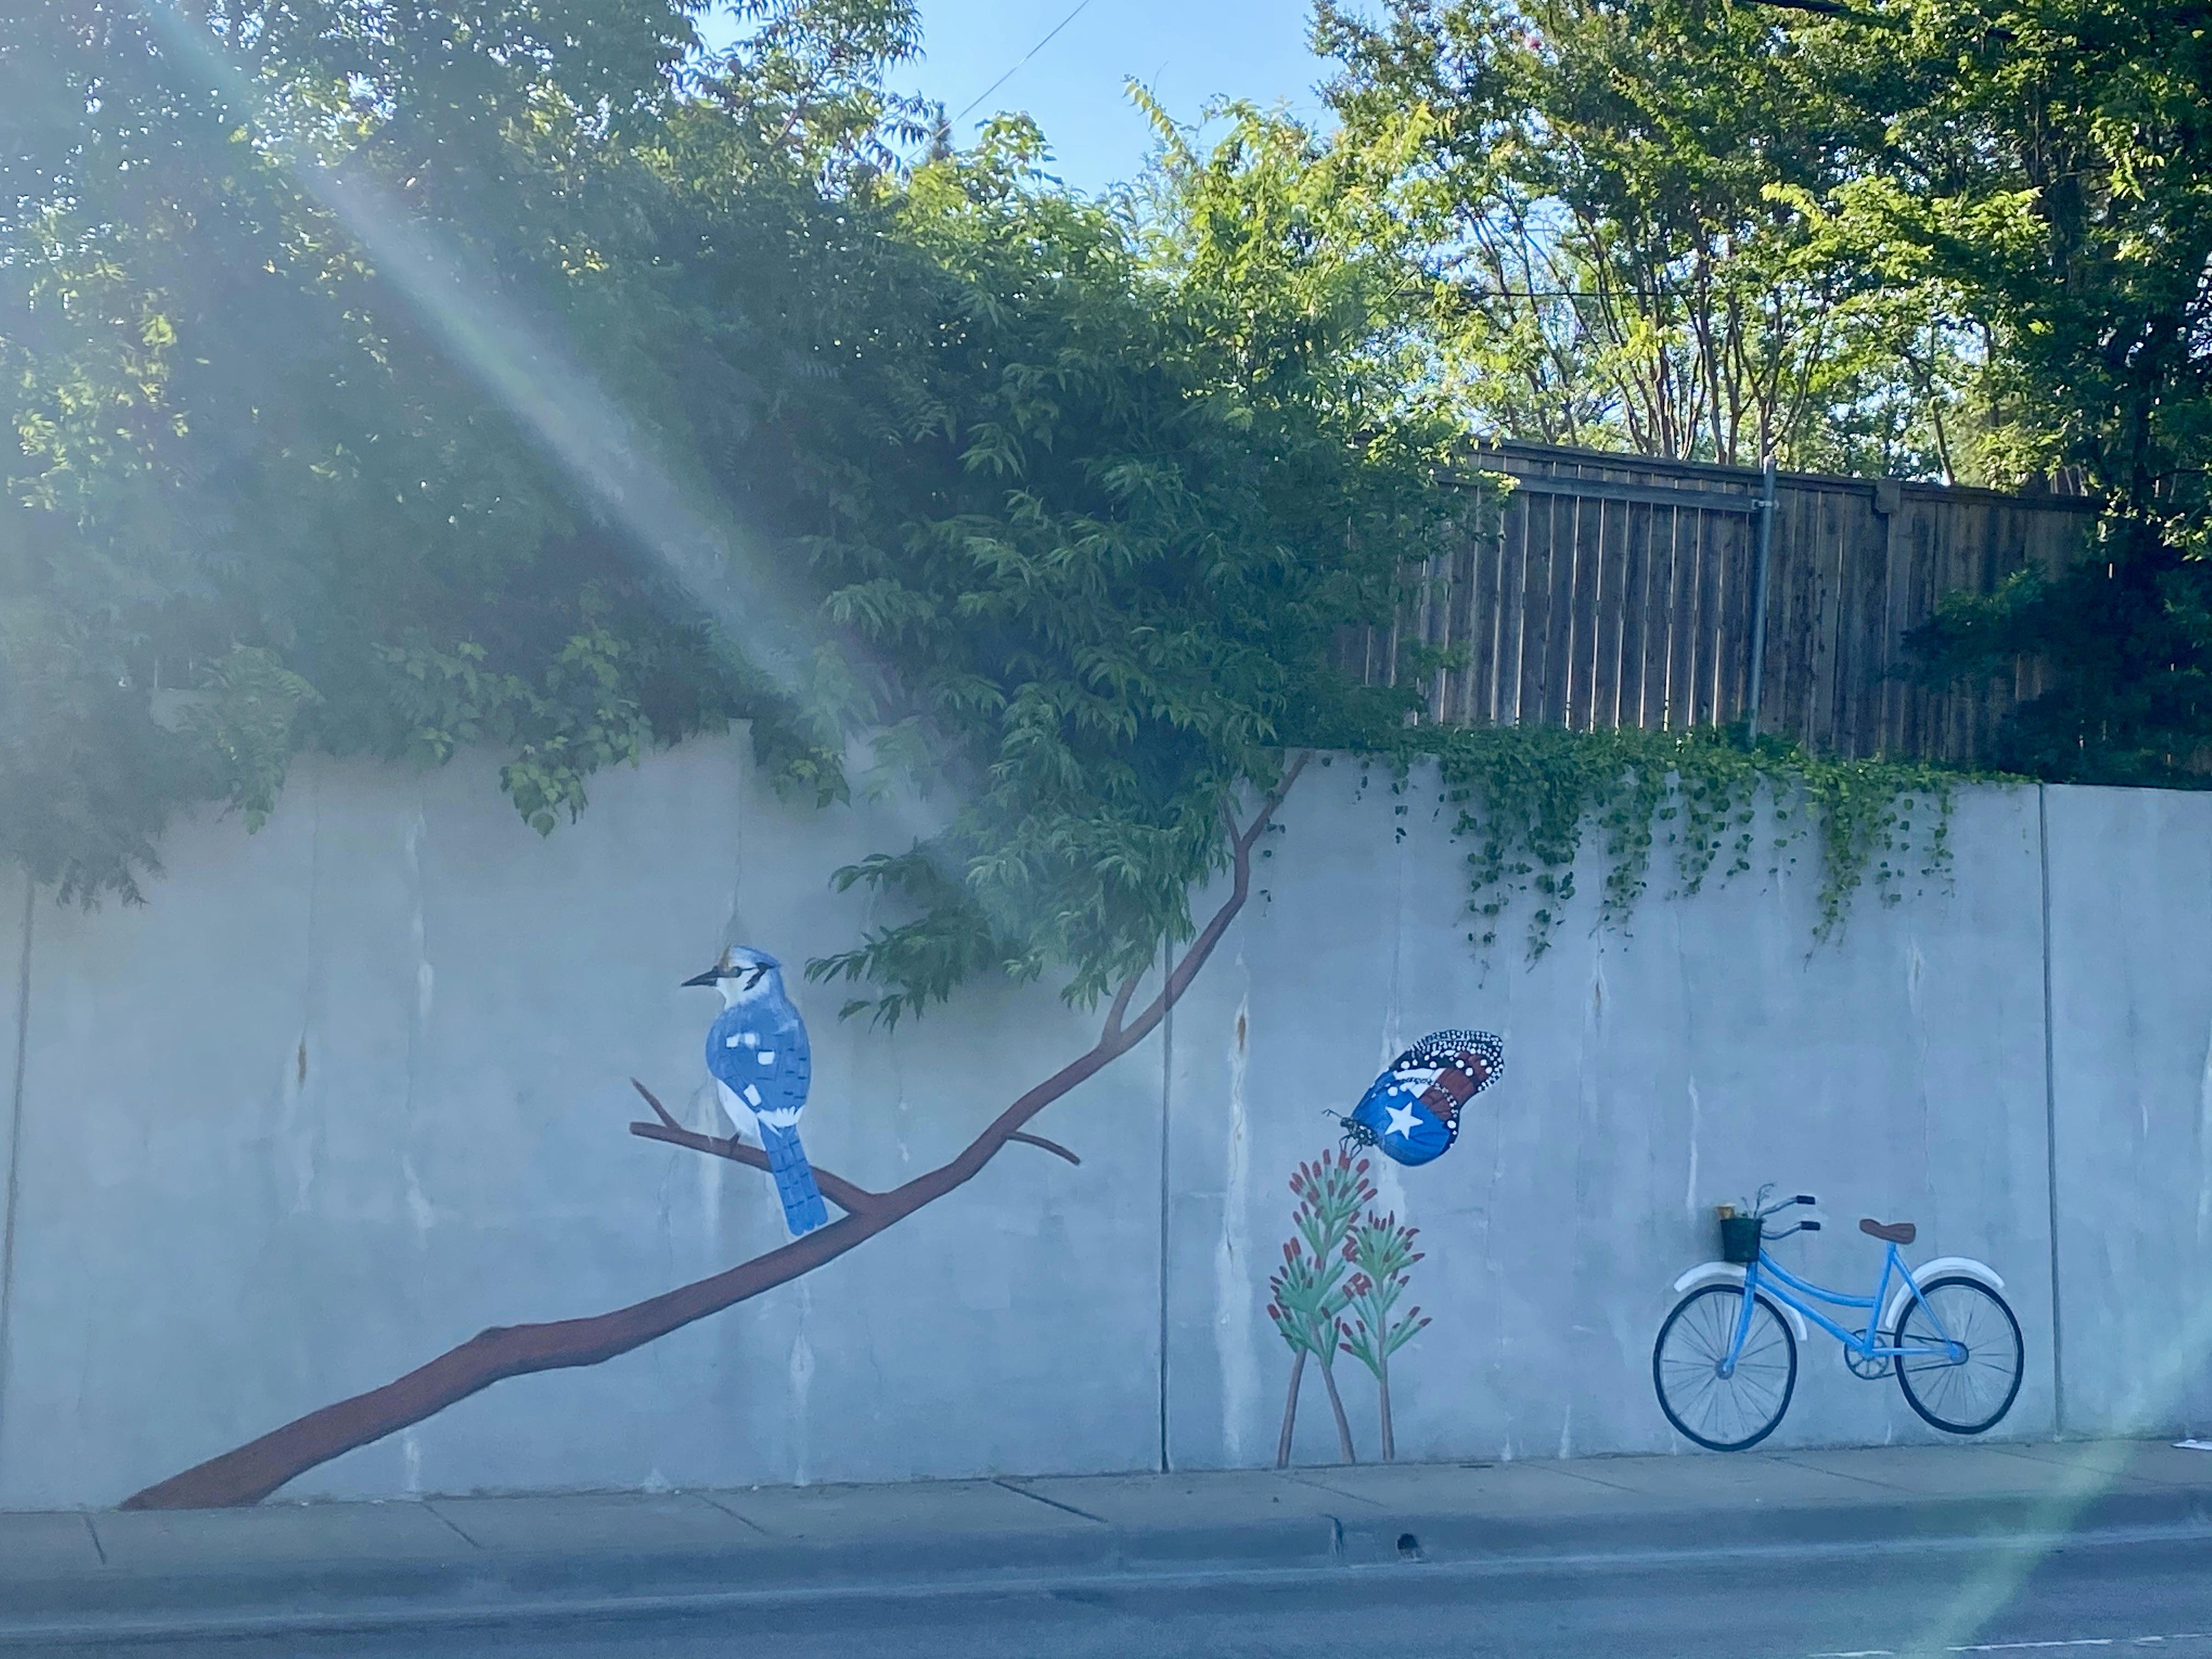 Street Mural on Marsh Ln in North Dallas